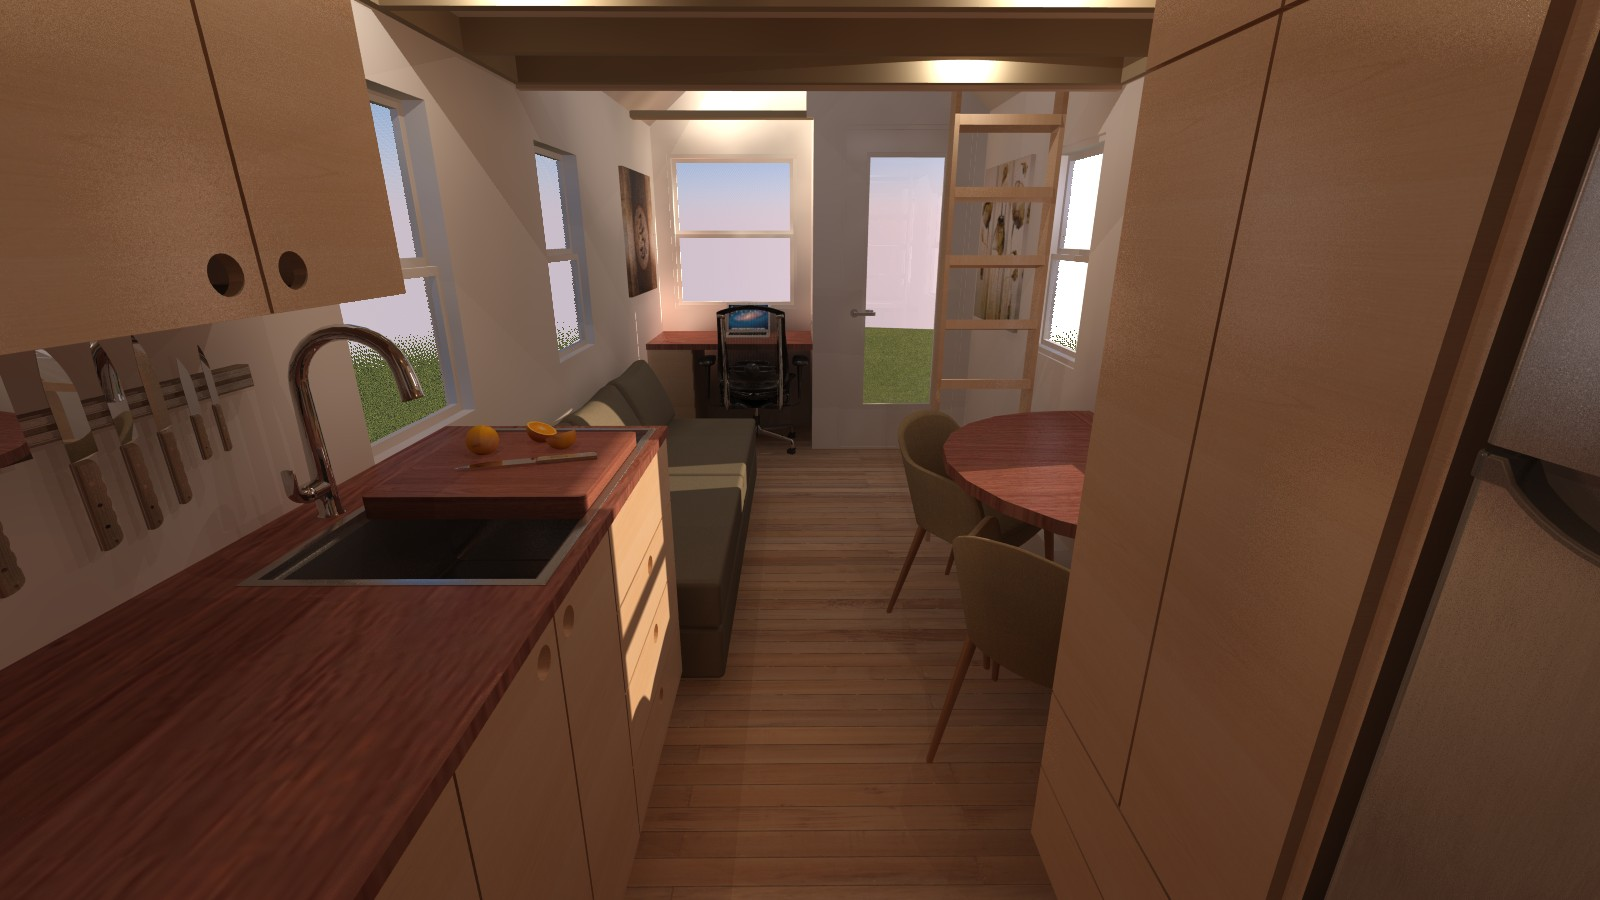 Caspar 20 Tiny House Interior from Back